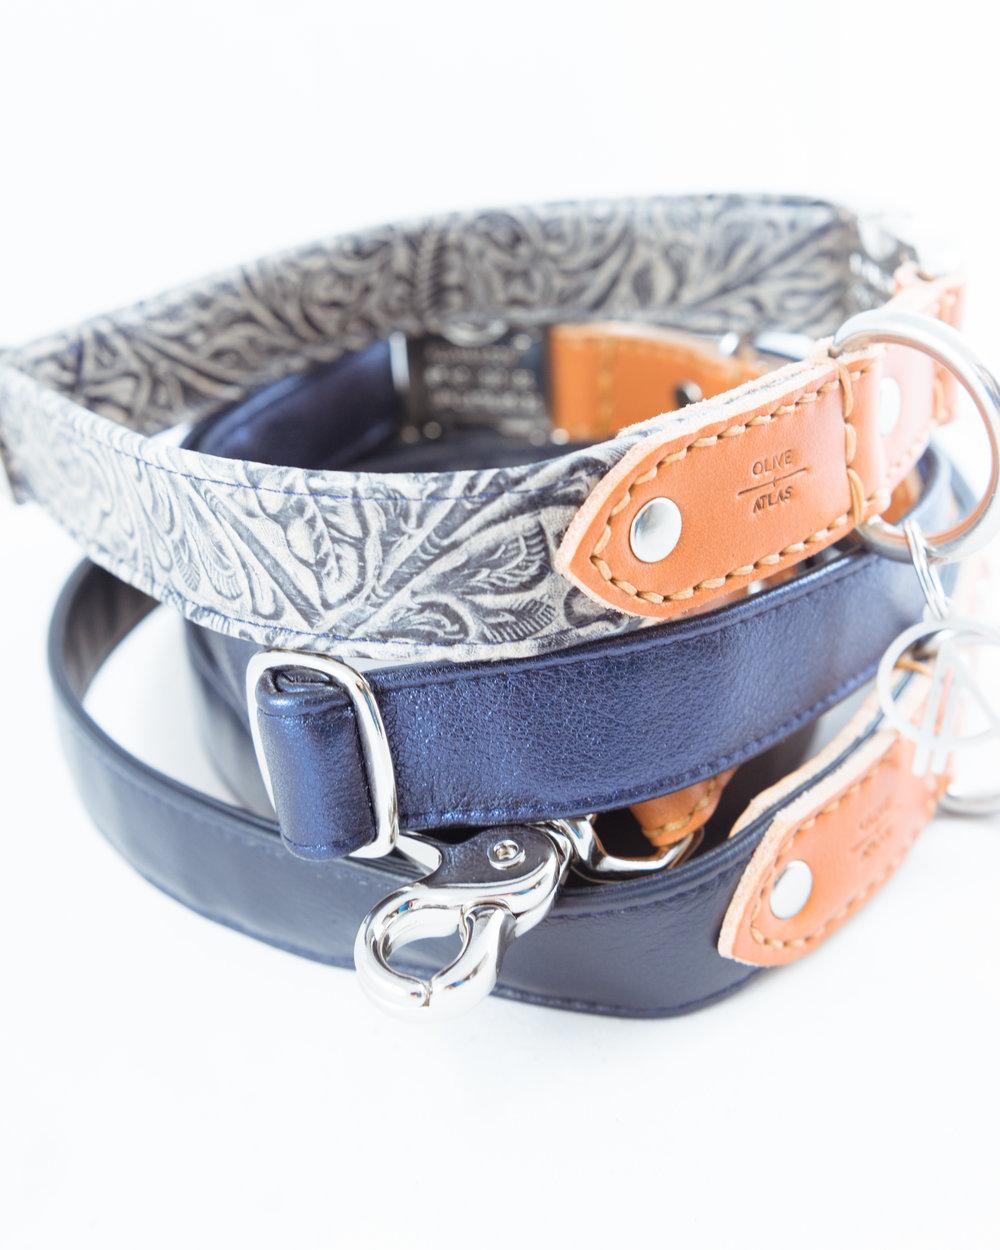 oliveandatlas_dog_collars_blues_sapphire_jacksonville_navy.JPG